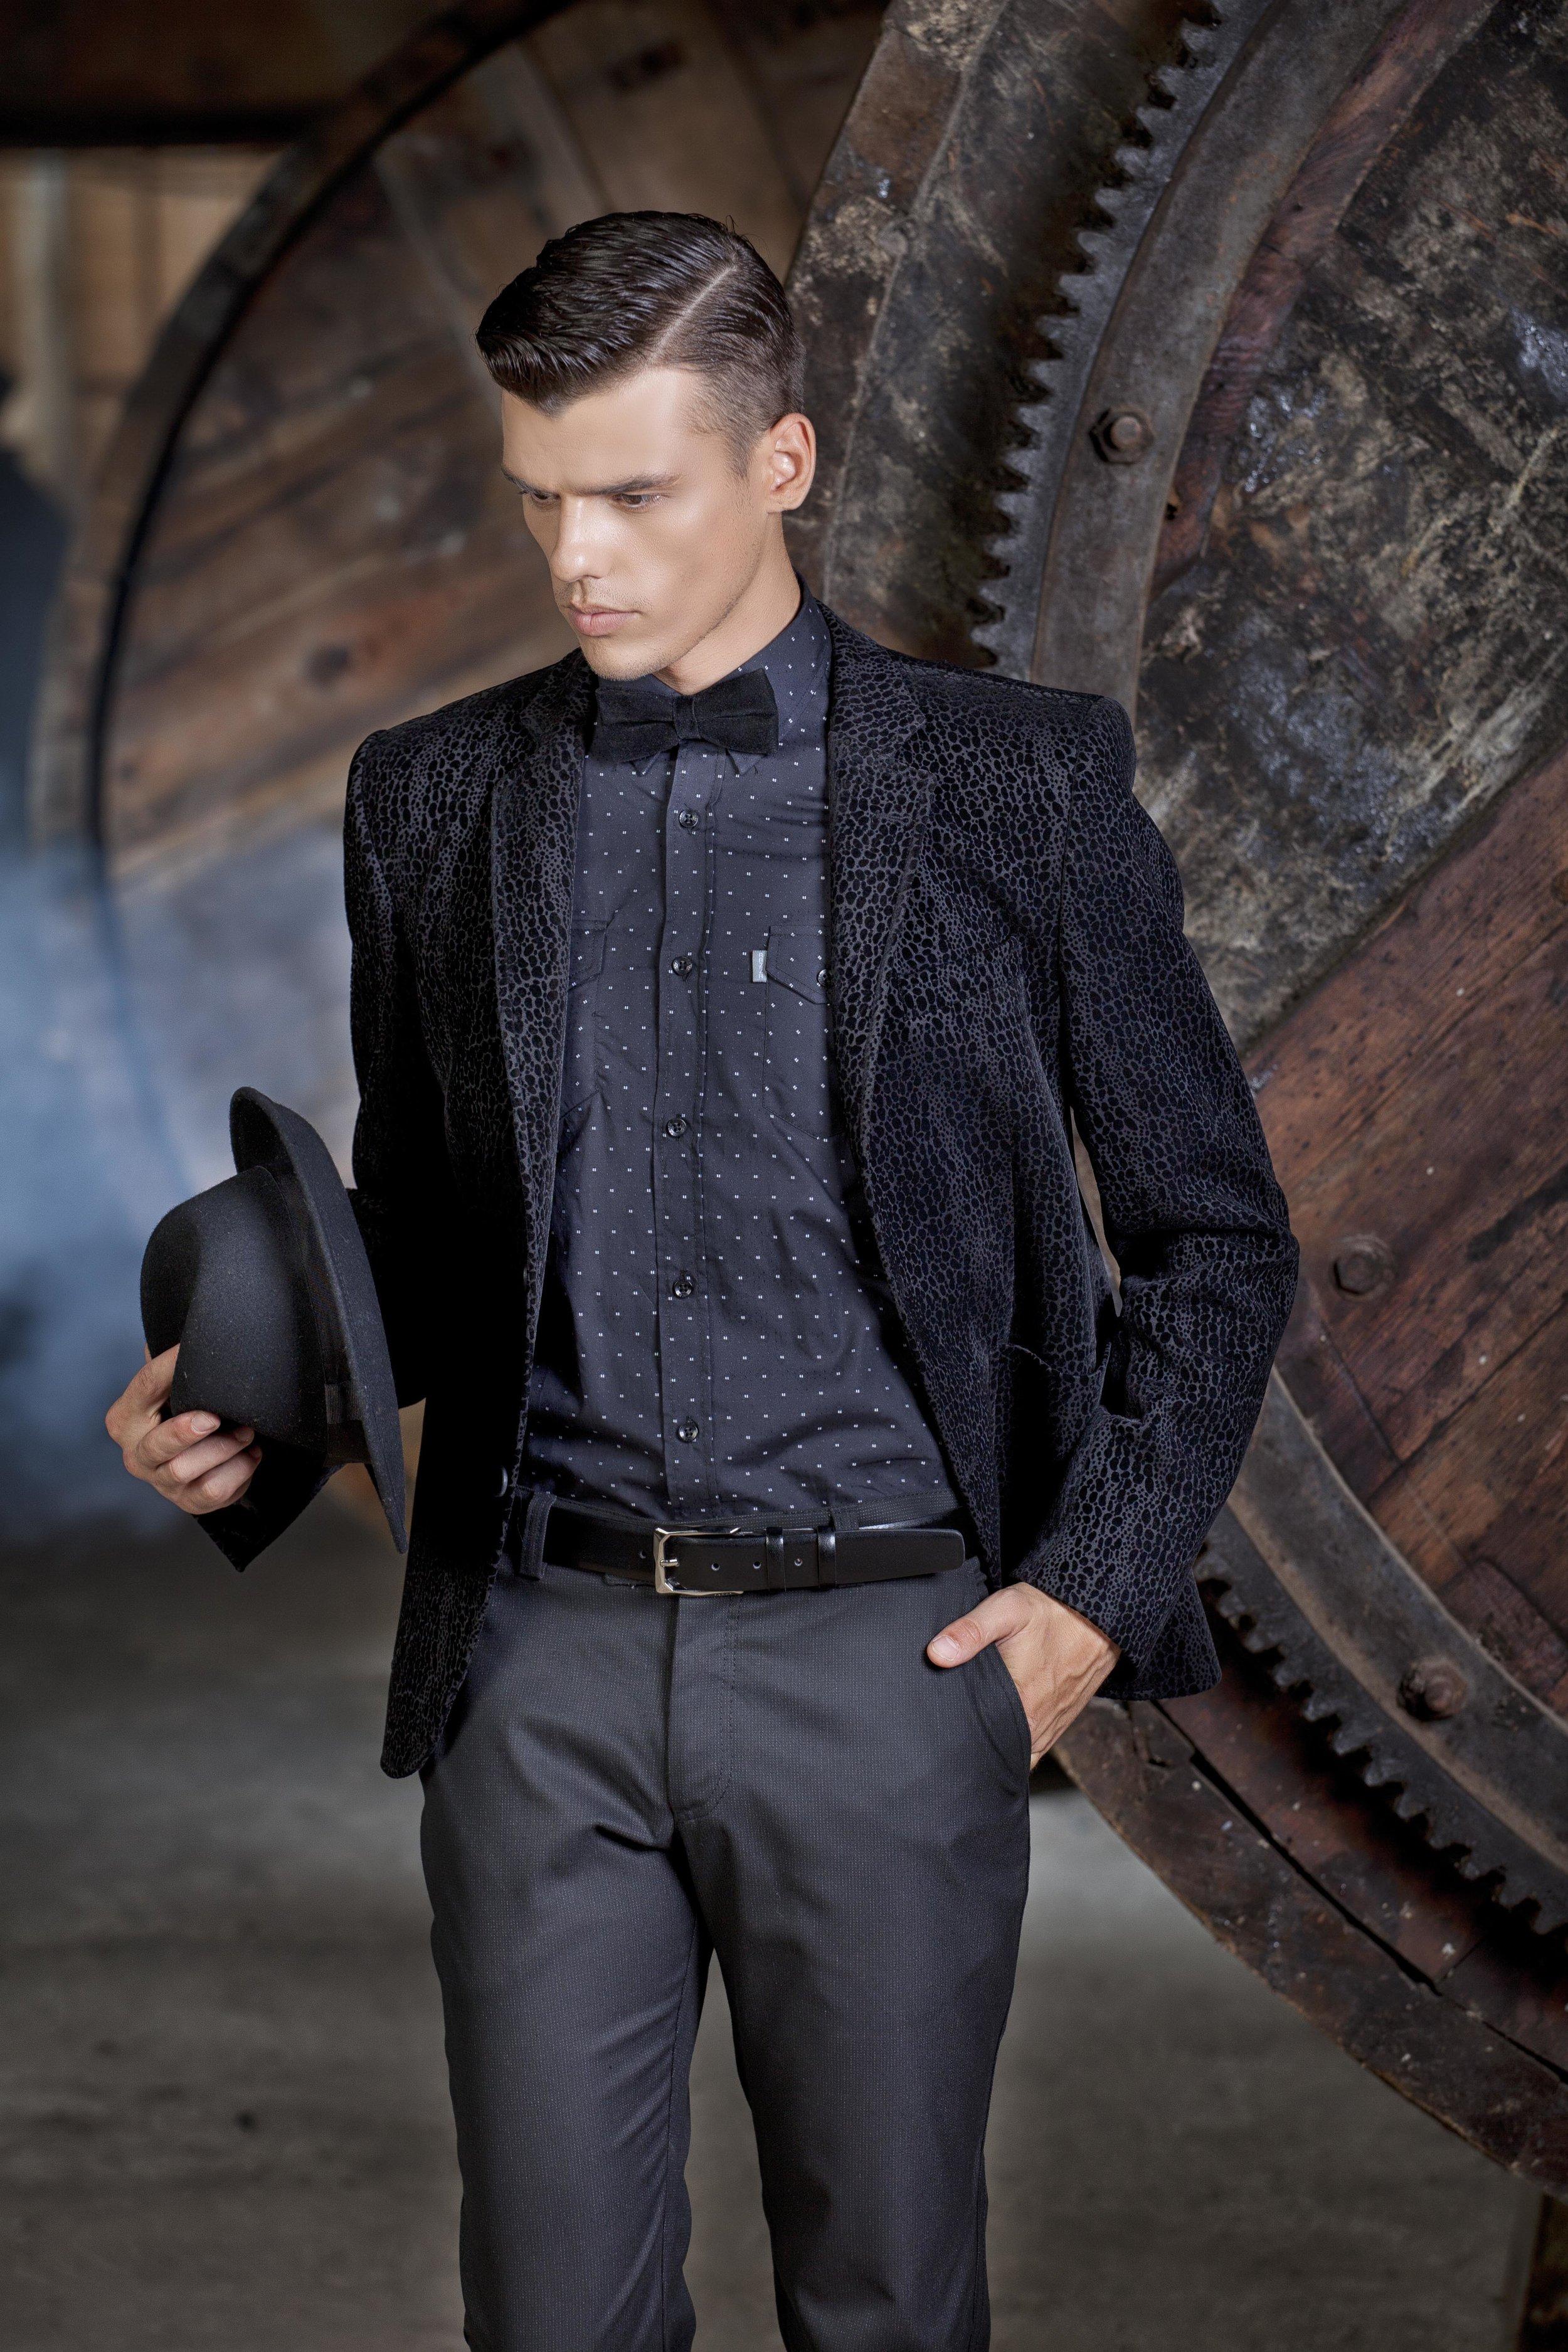 Ugur_Bektas_Fashion_Moda_fotograf_Set_7_007.jpg